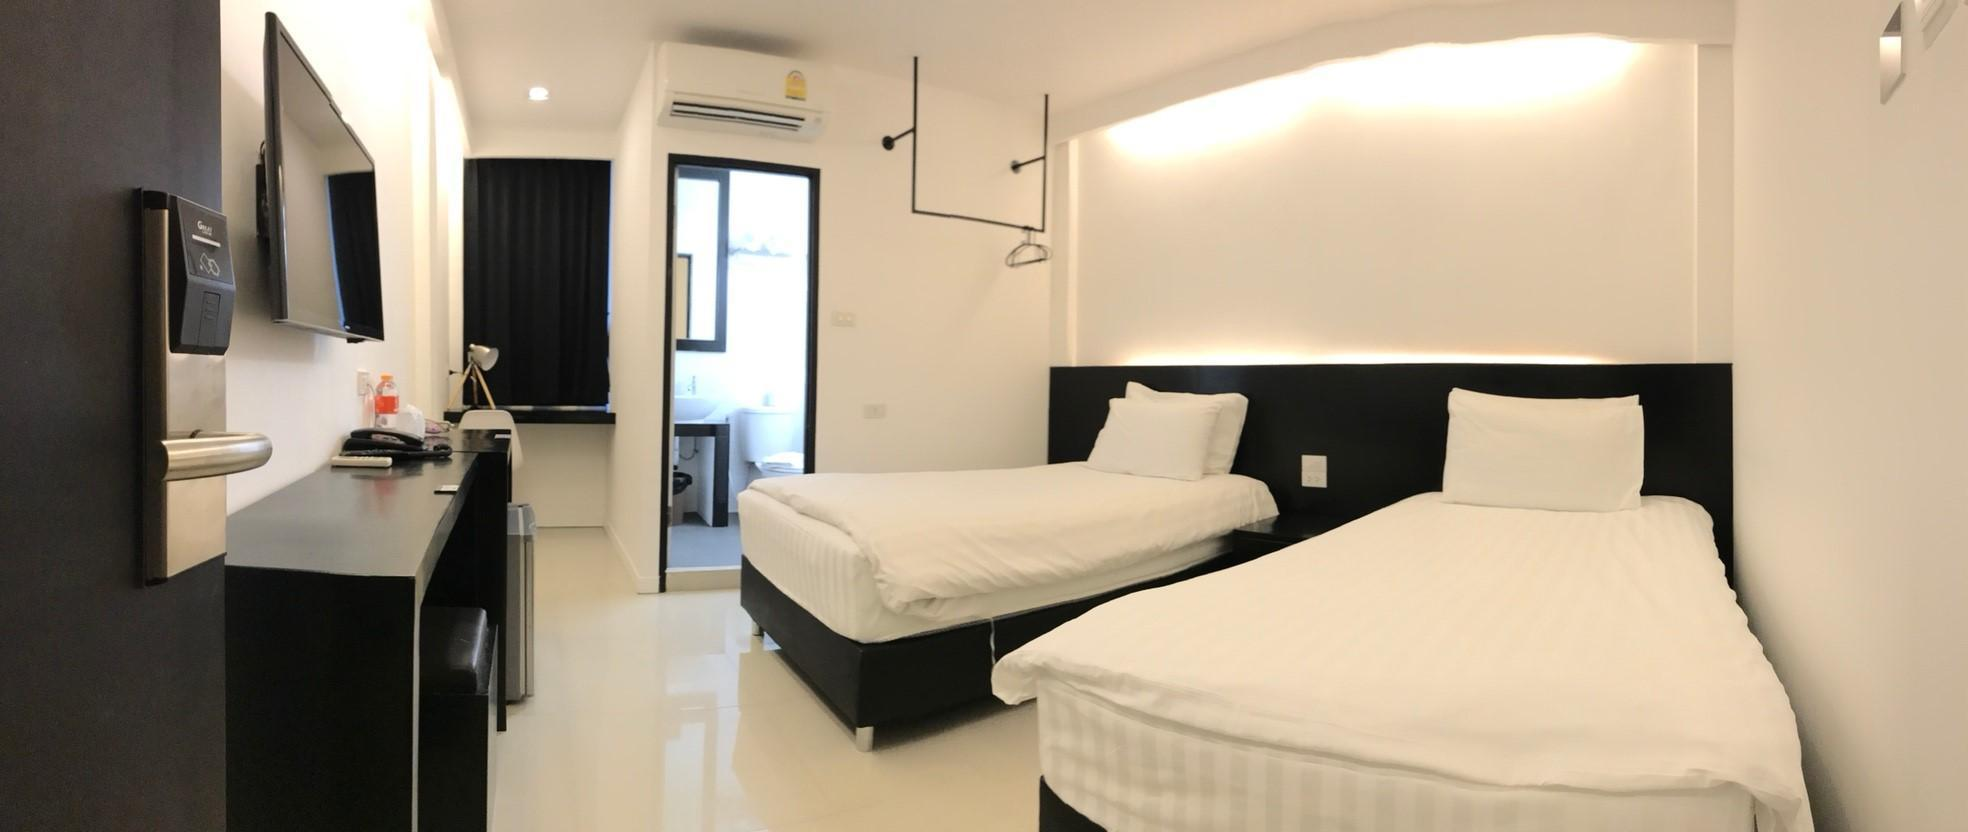 The Nimman Apartment NT3 อพาร์ตเมนต์ 1 ห้องนอน 1 ห้องน้ำส่วนตัว ขนาด 22 ตร.ม. – นิมมานเหมินทร์